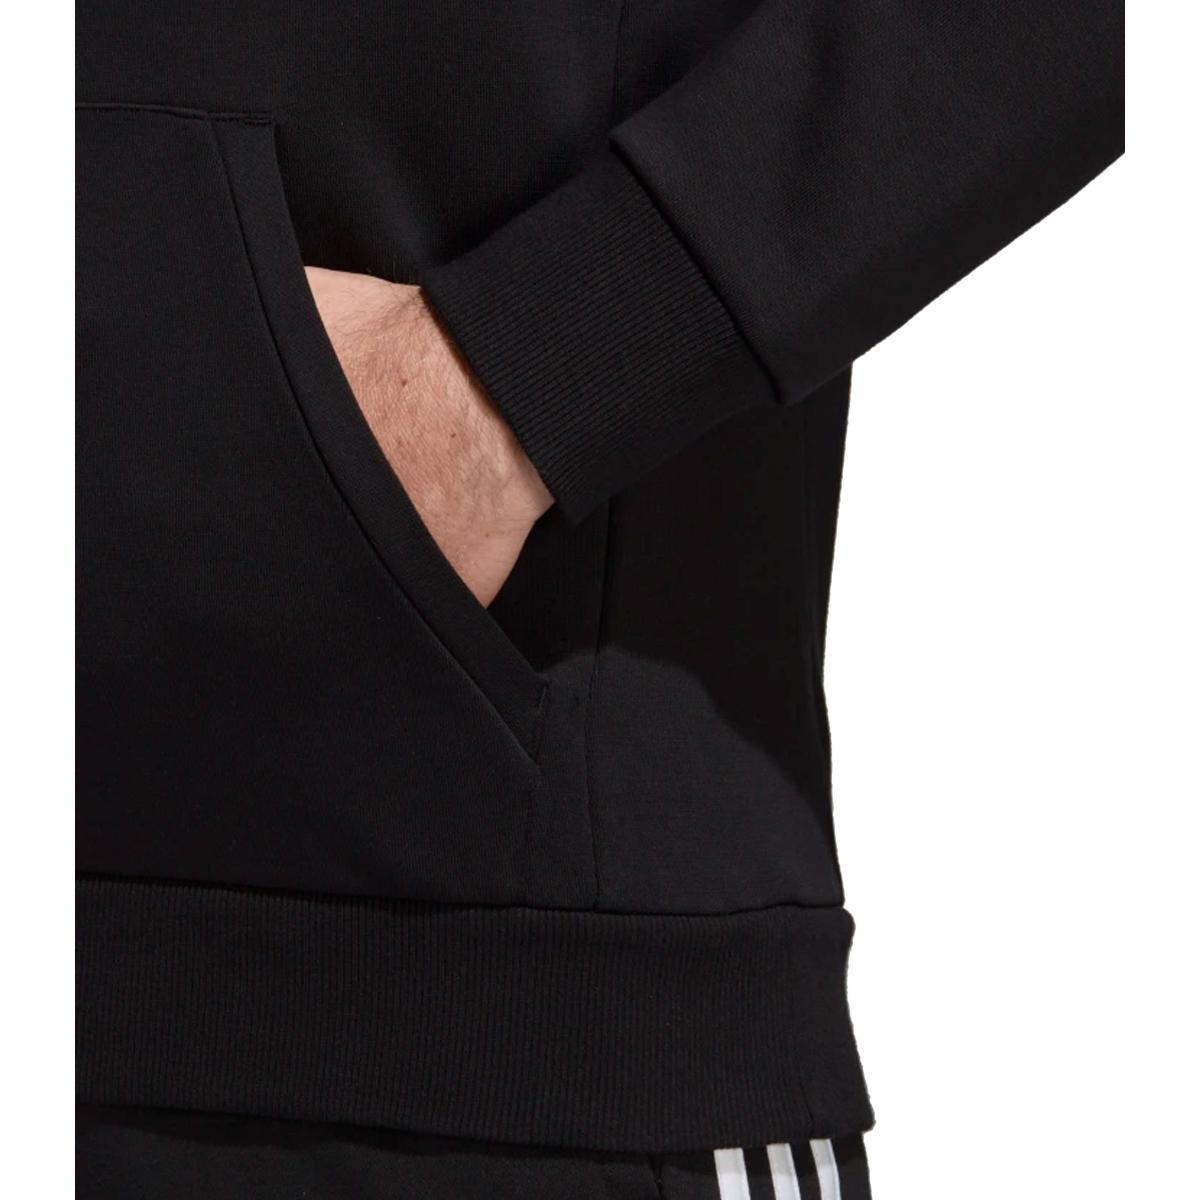 Felpa con cappuccio Adidas Must Haves Badge of Sport da uomo rif. DQ1461